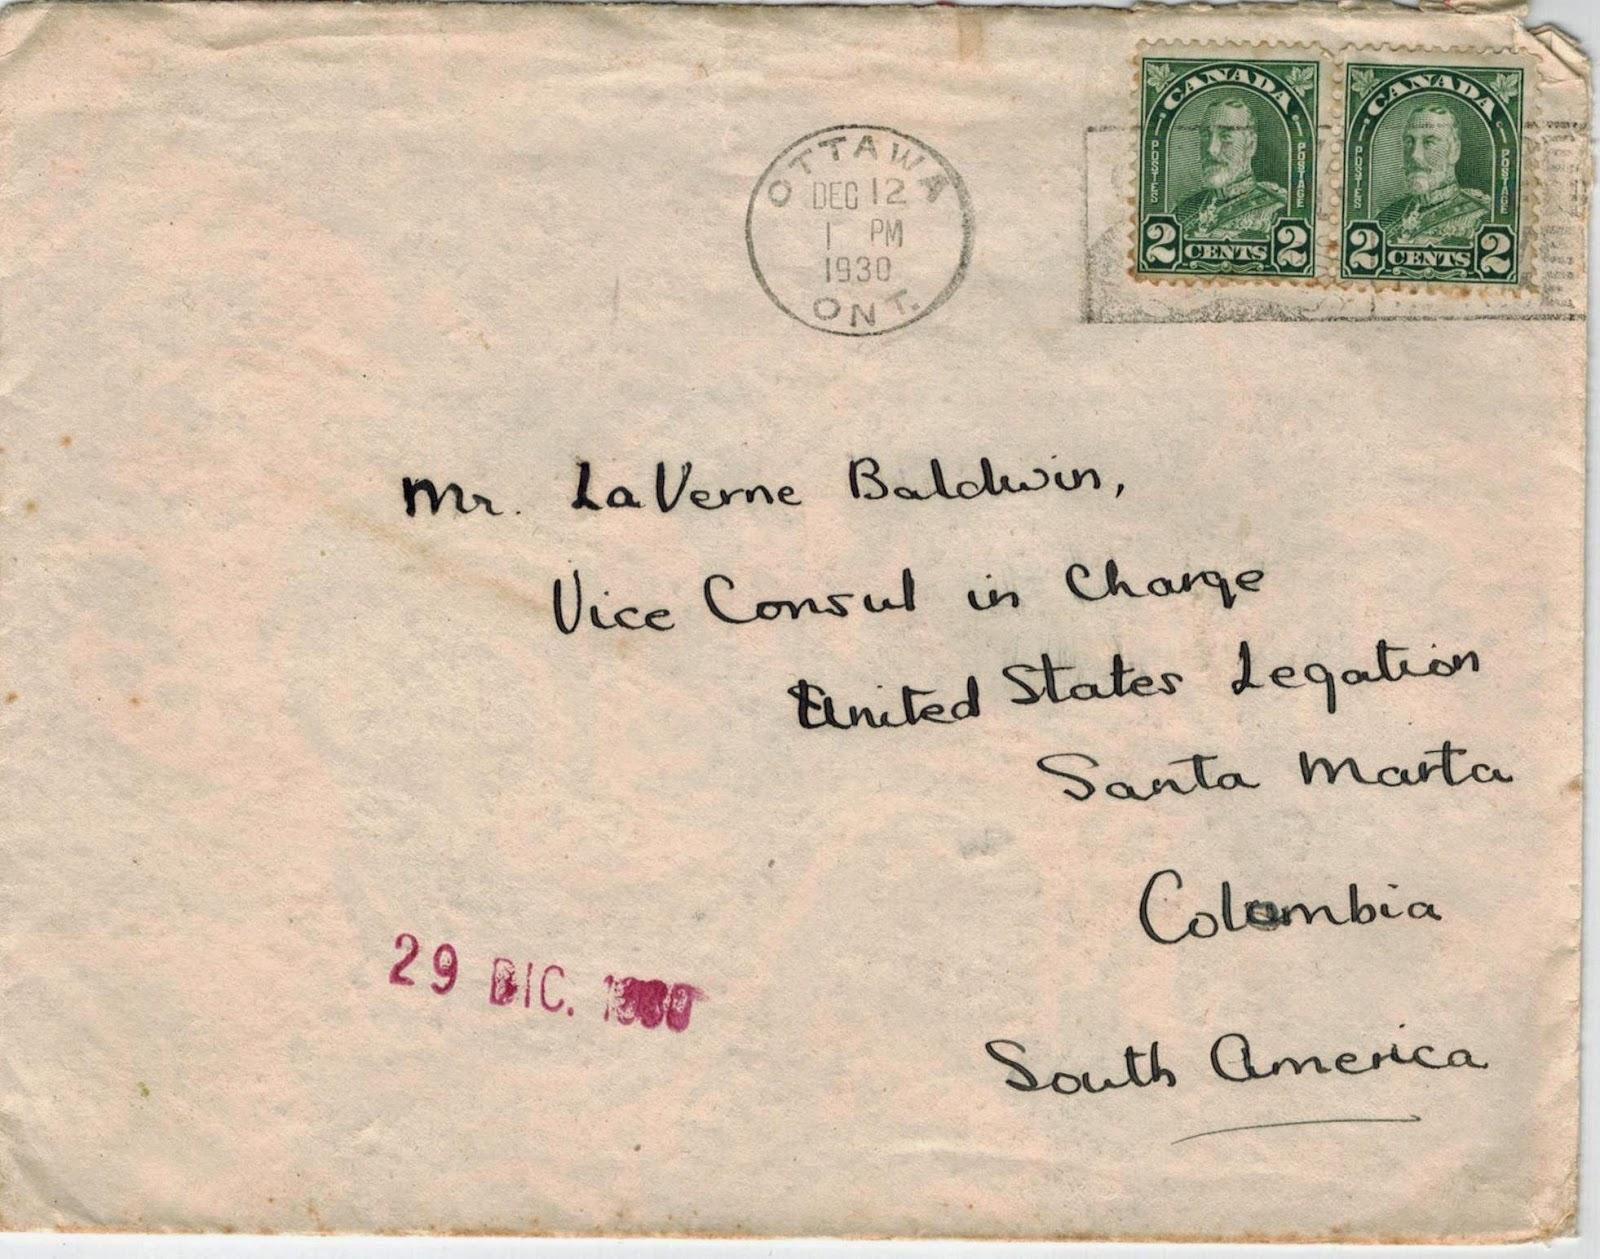 Postal history corner 9 reduced international letter rates ottawa to santa marta colombia december 12 1930 spiritdancerdesigns Gallery